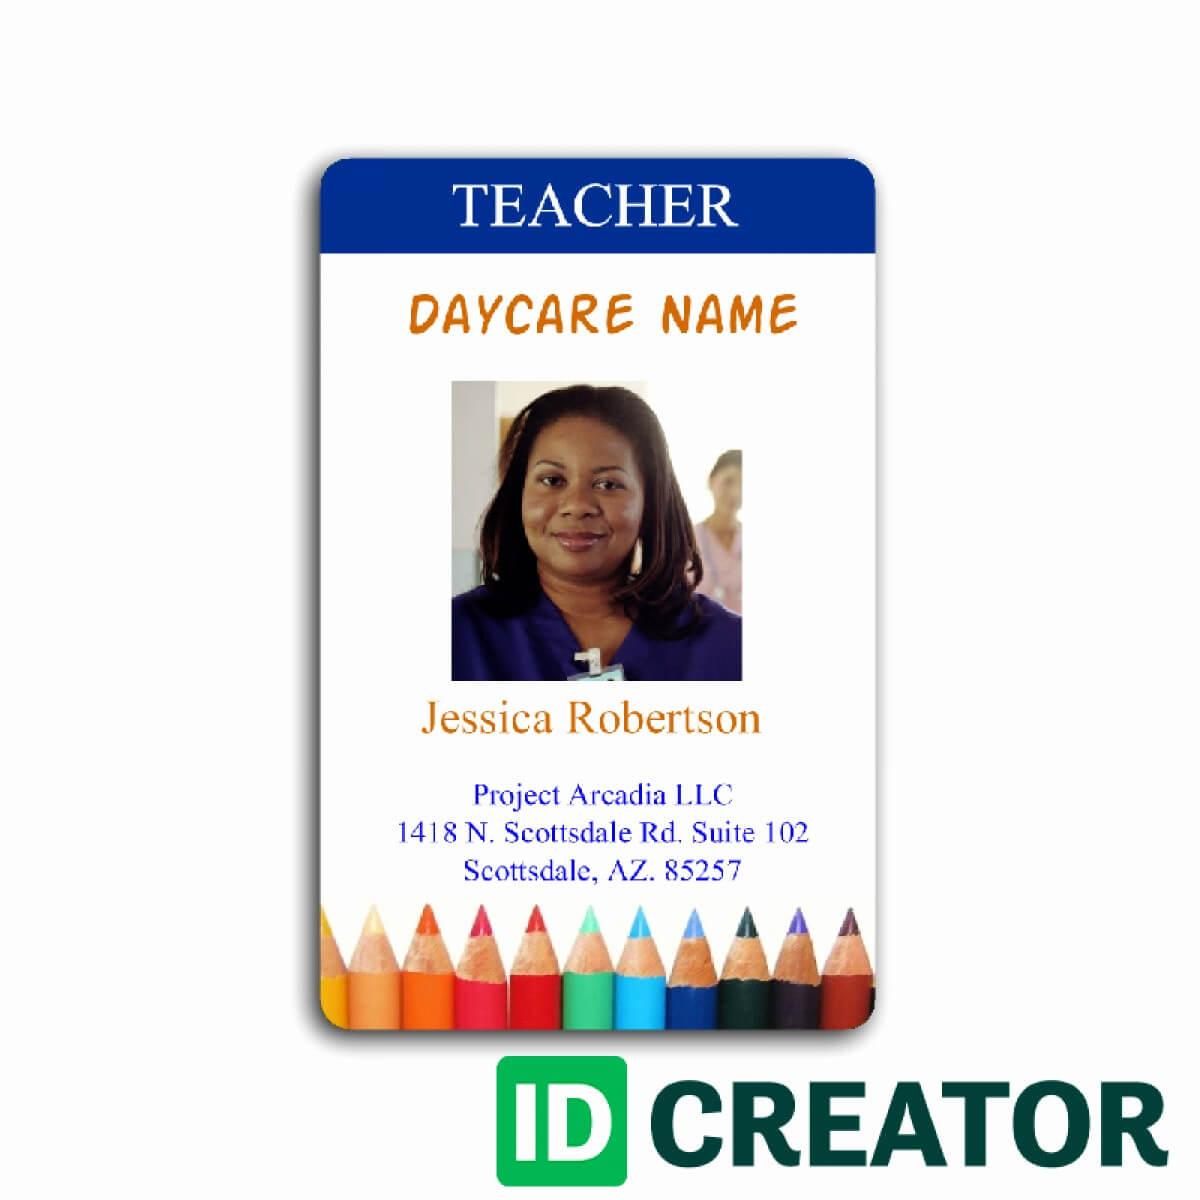 009 School Id Card Template Free Teacher Elegant Employee With Regard To Teacher Id Card Template